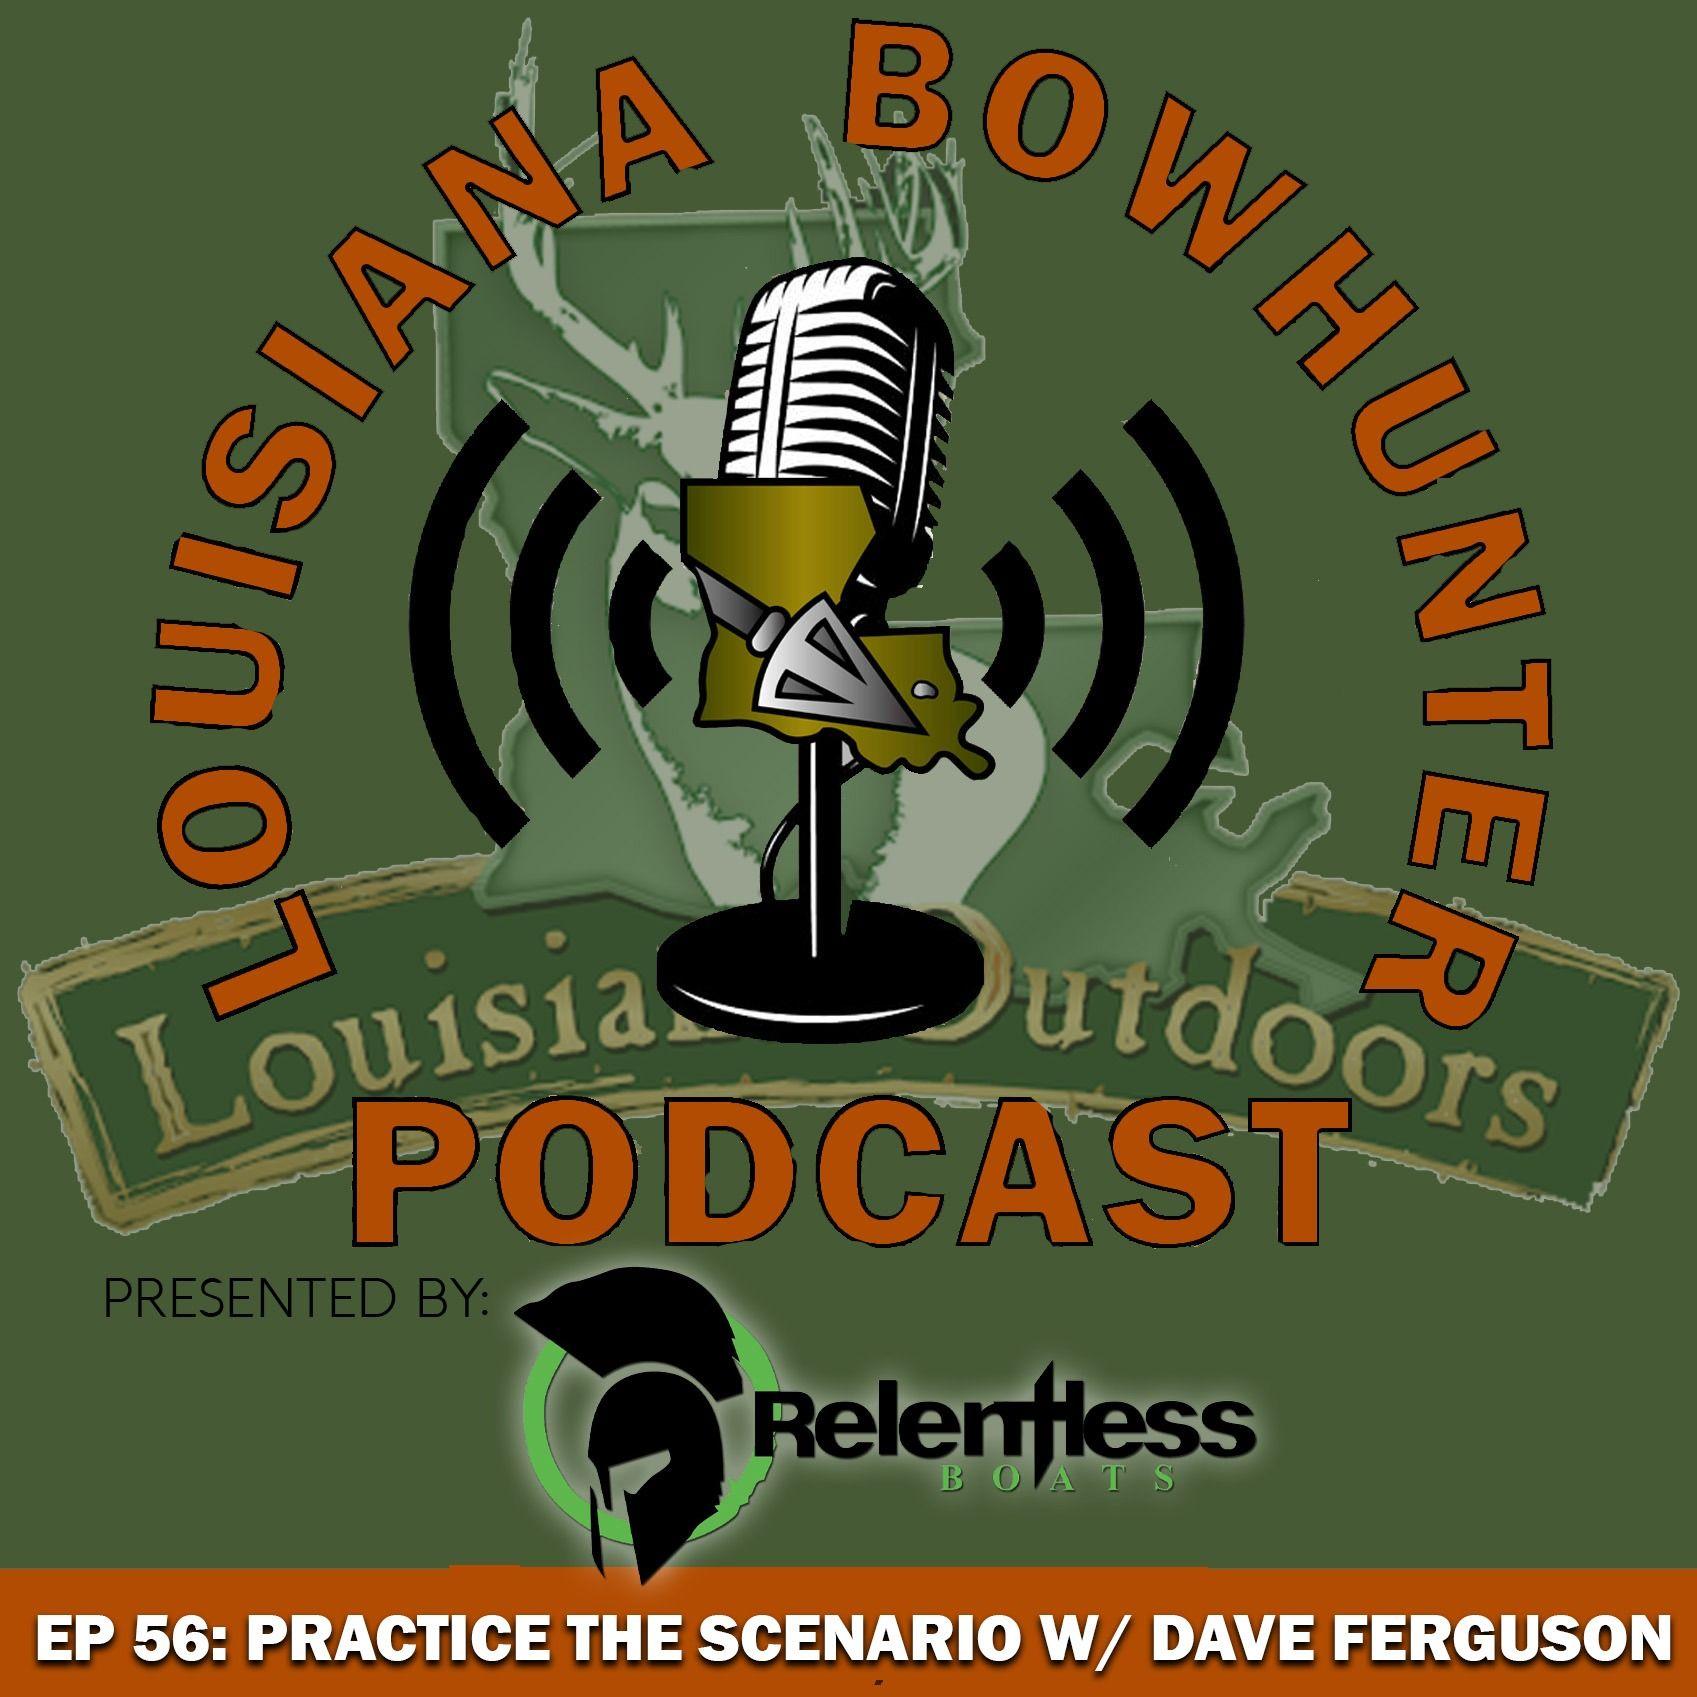 Episode 56: Practice the Scenario w/ Dave Ferguson